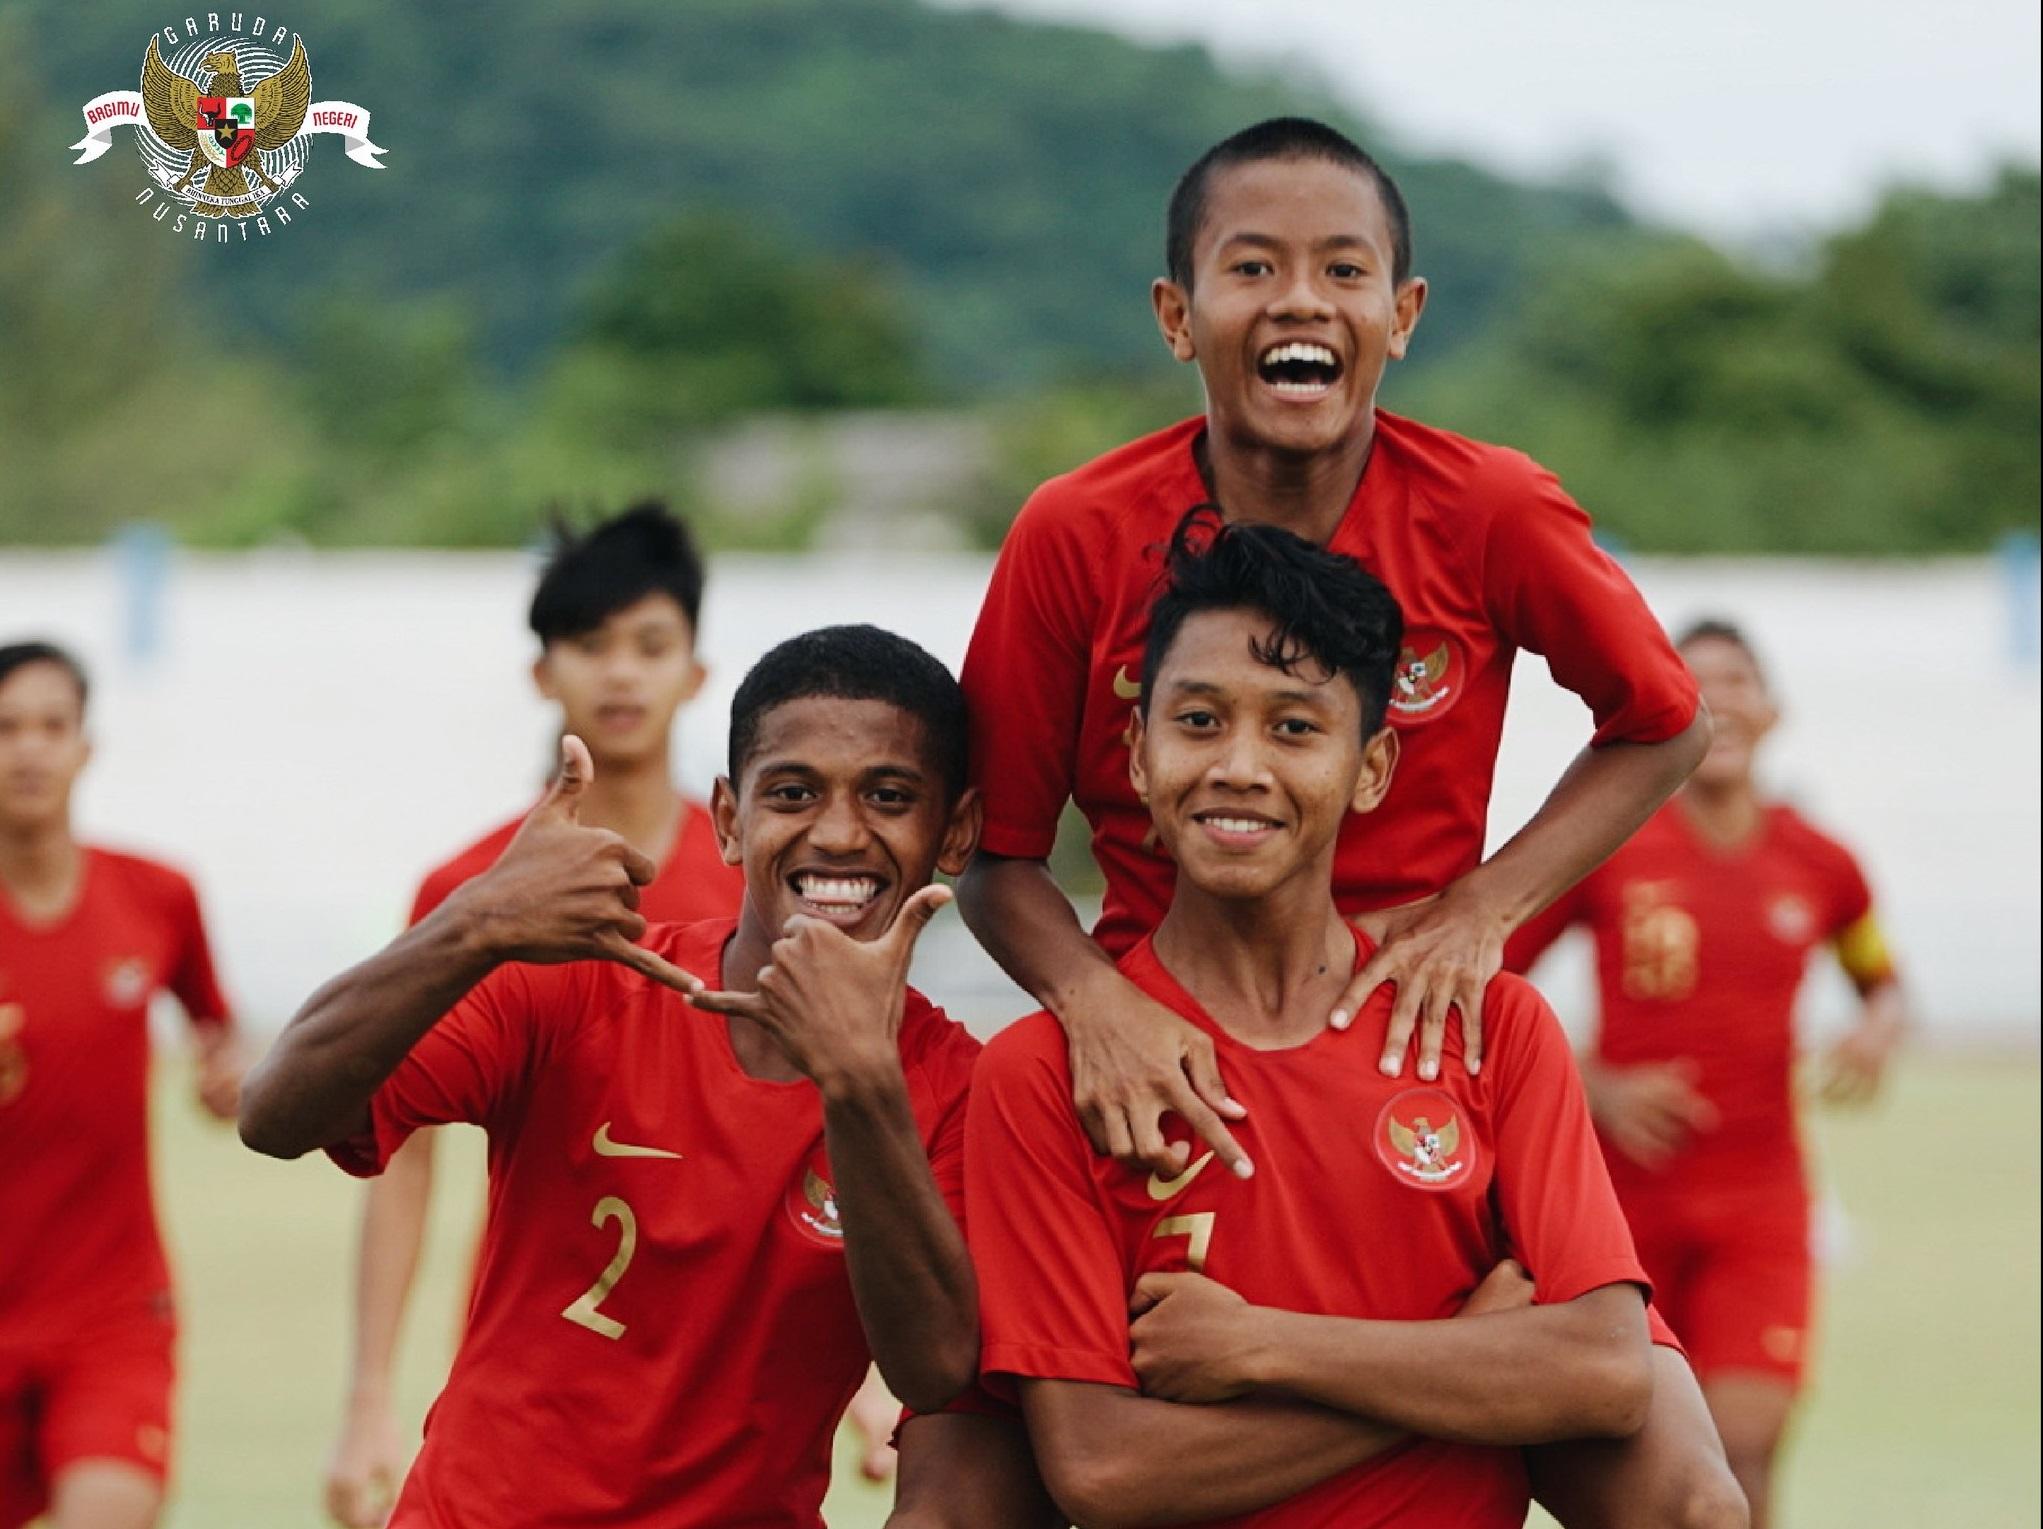 https: img-z.okeinfo.net content 2019 08 09 51 2090050 timnas-indonesia-u-15-raih-posisi-ketiga-bima-sakti-ucapkan-terima-kasih-bFrYPqRDoz.jpg